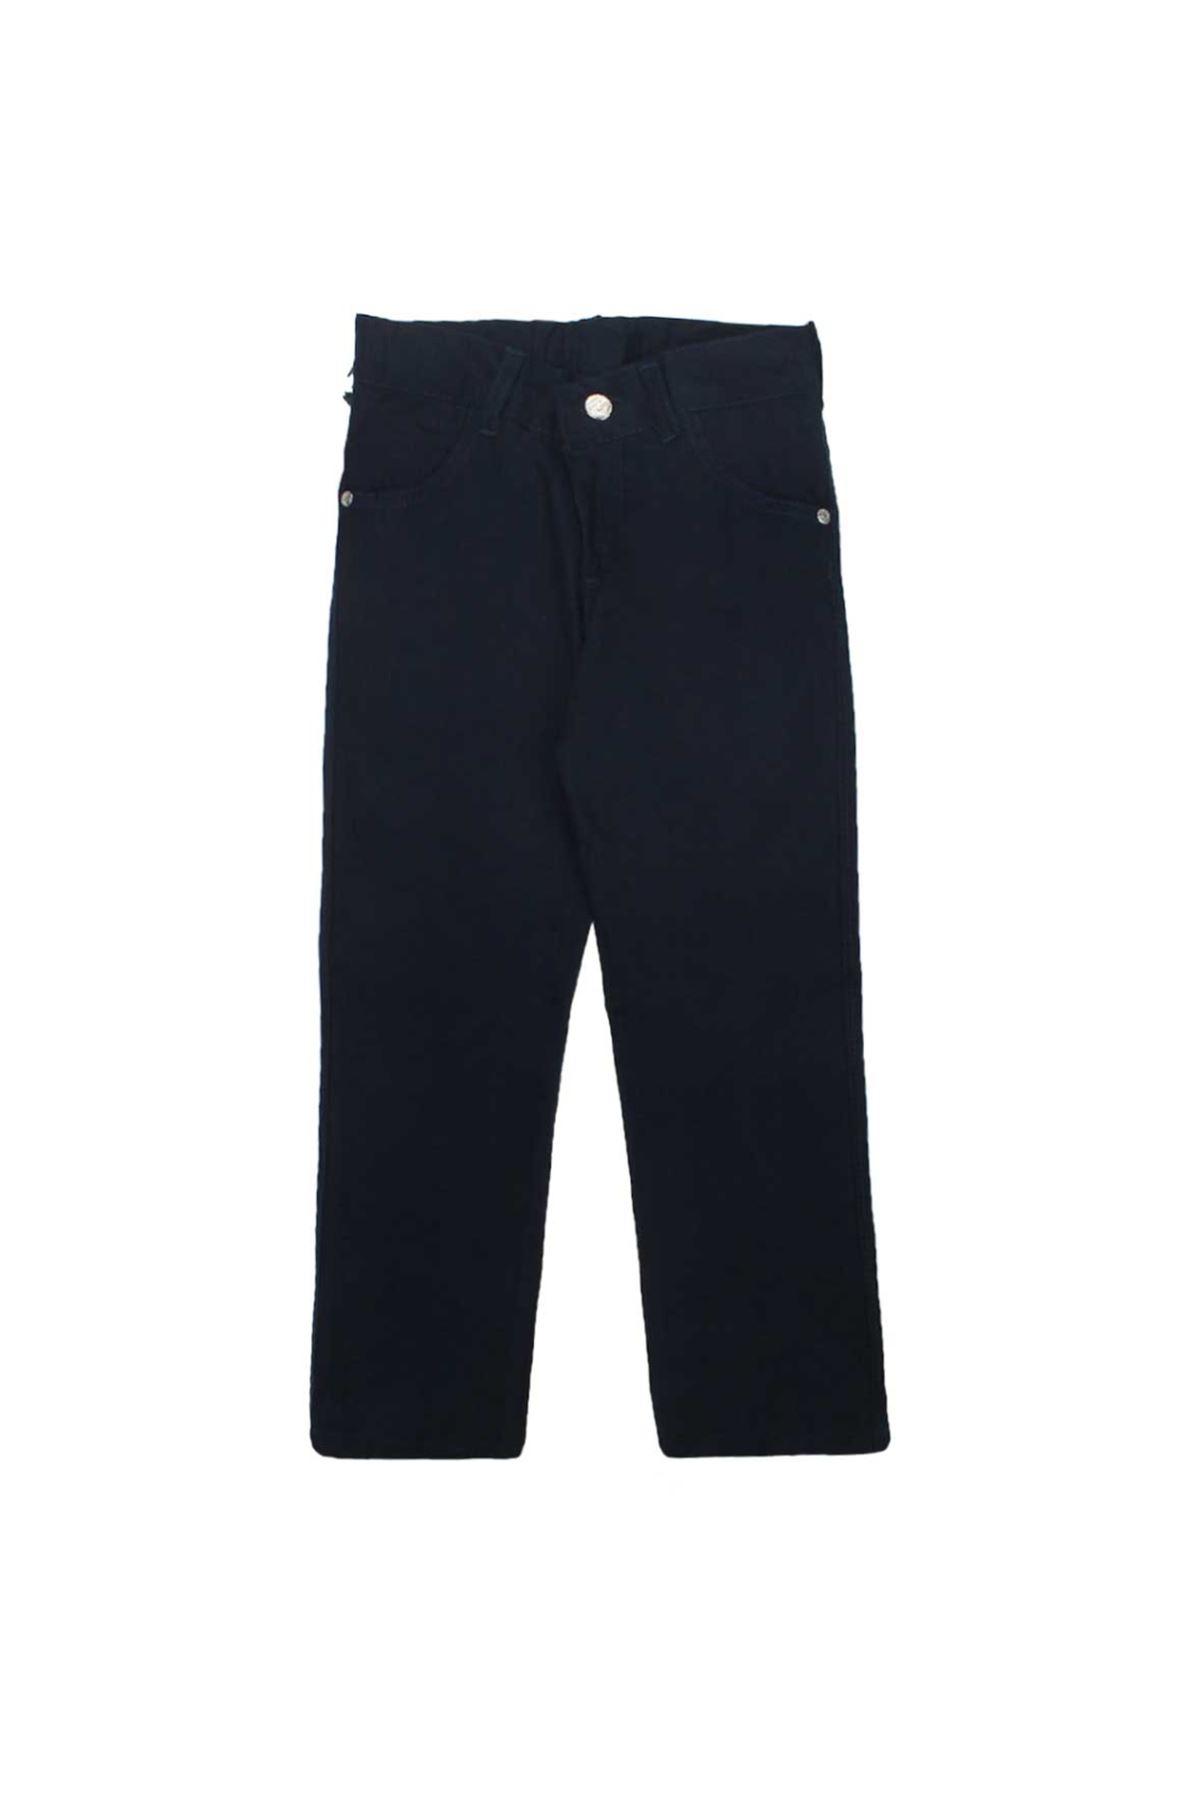 Lacivert  Erkek Çocuk Keten Pantolon